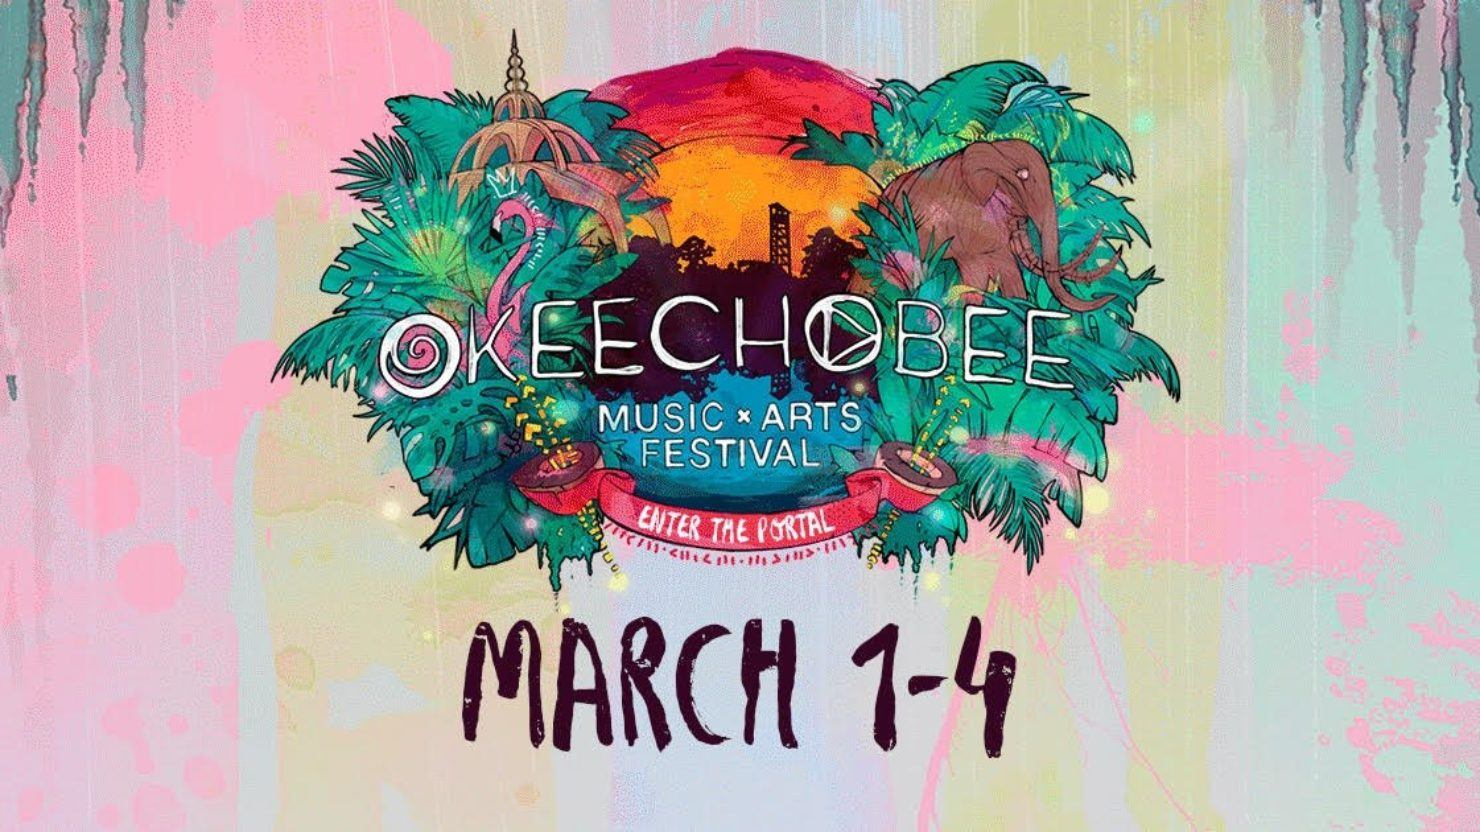 Okeechobee Music & Arts Festival Announces 2018 Dates